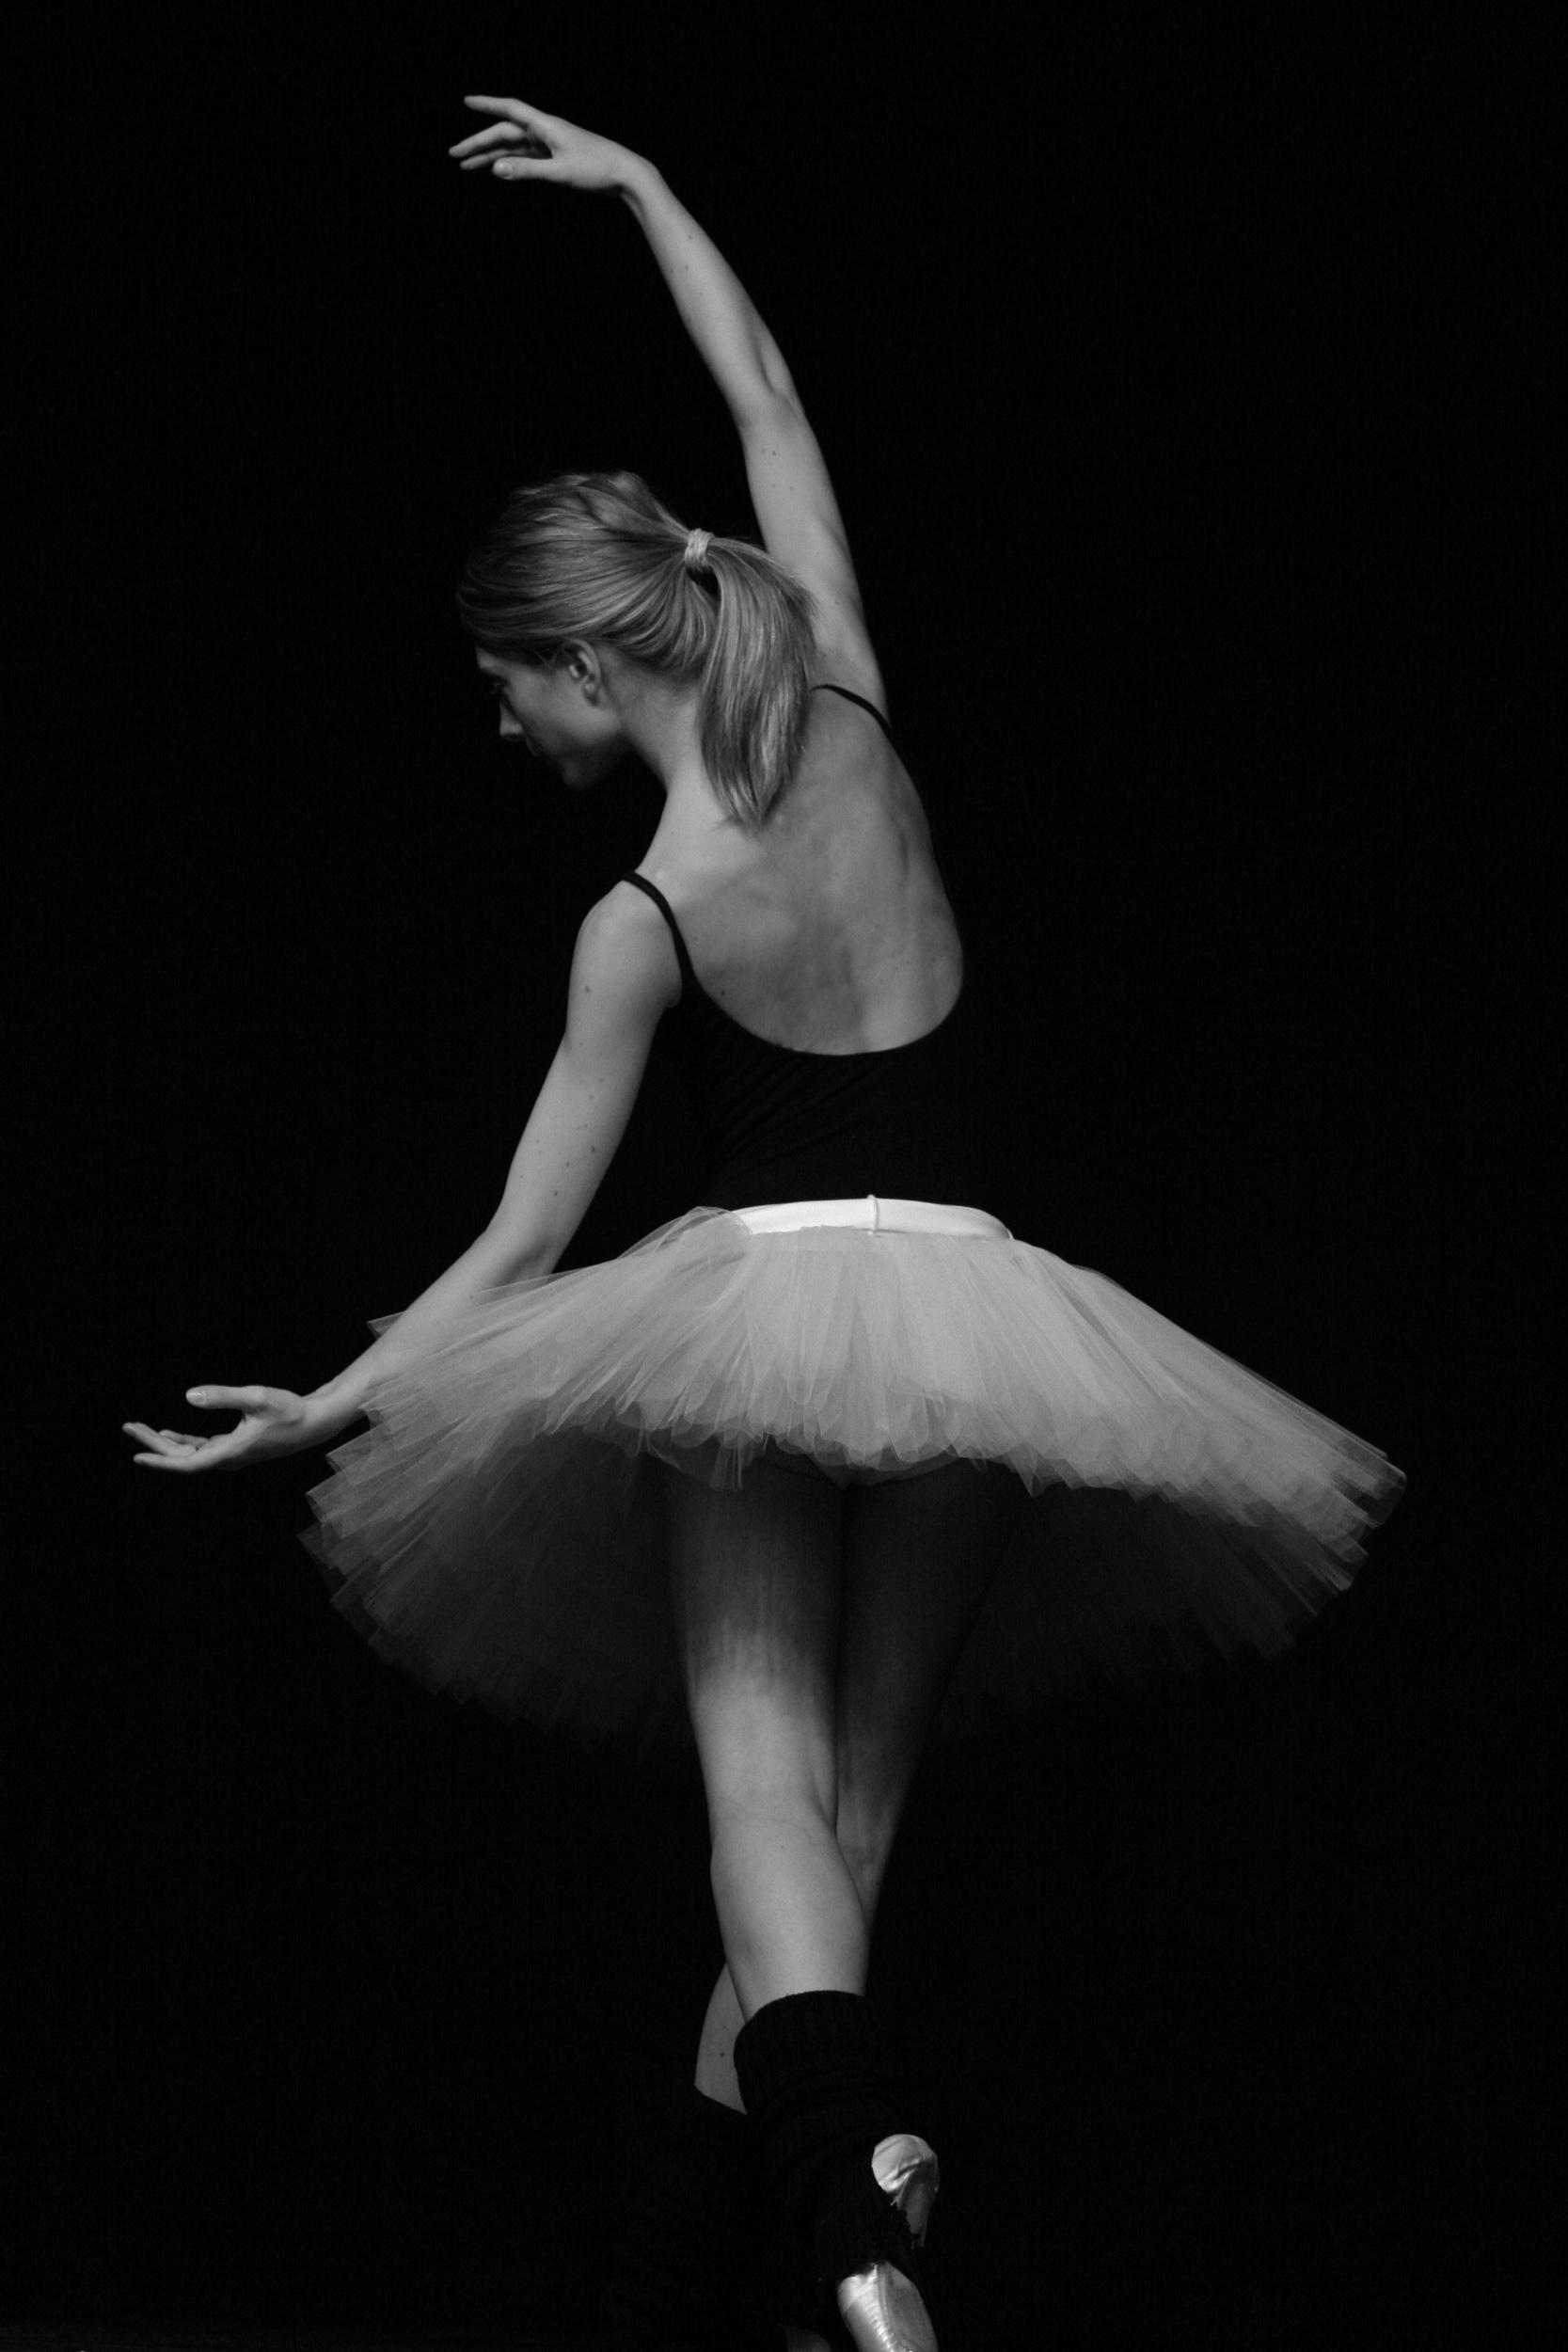 Фото балерин в зале 1 фотография